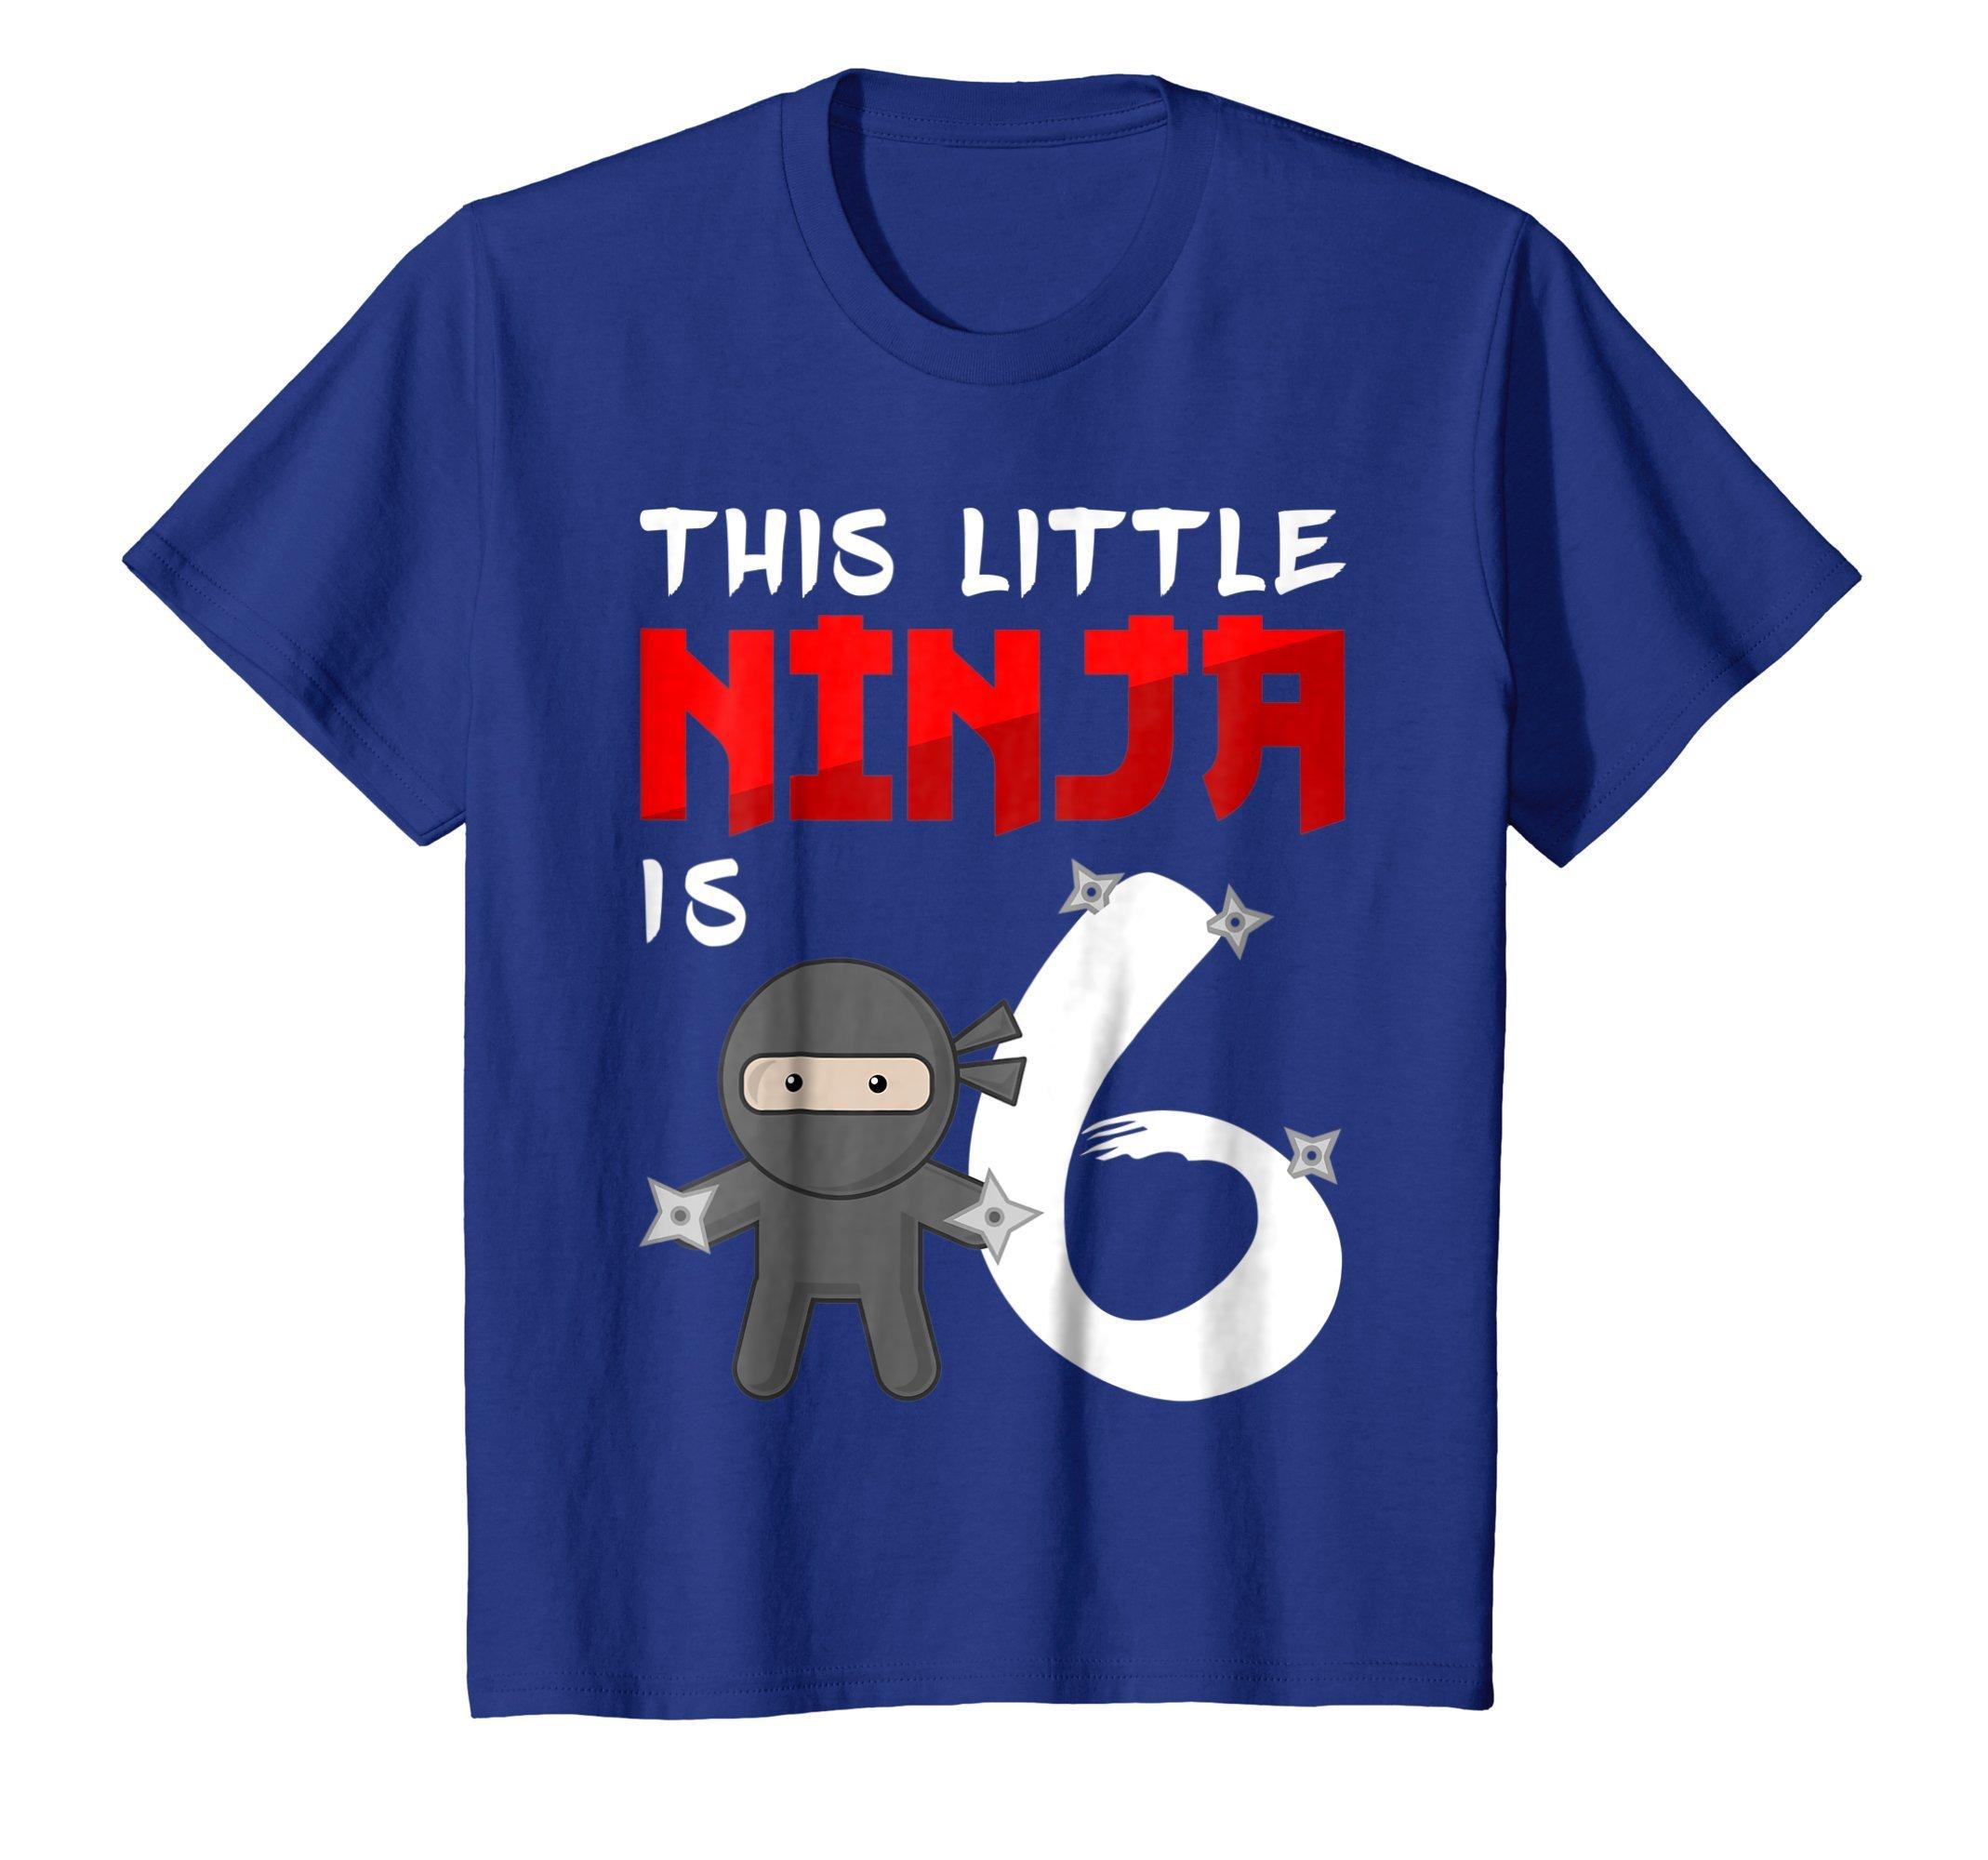 Kids Ninja Birthday Shirt 6 Year Old 6th Birthday Party Girl Boy 8 Royal Blue